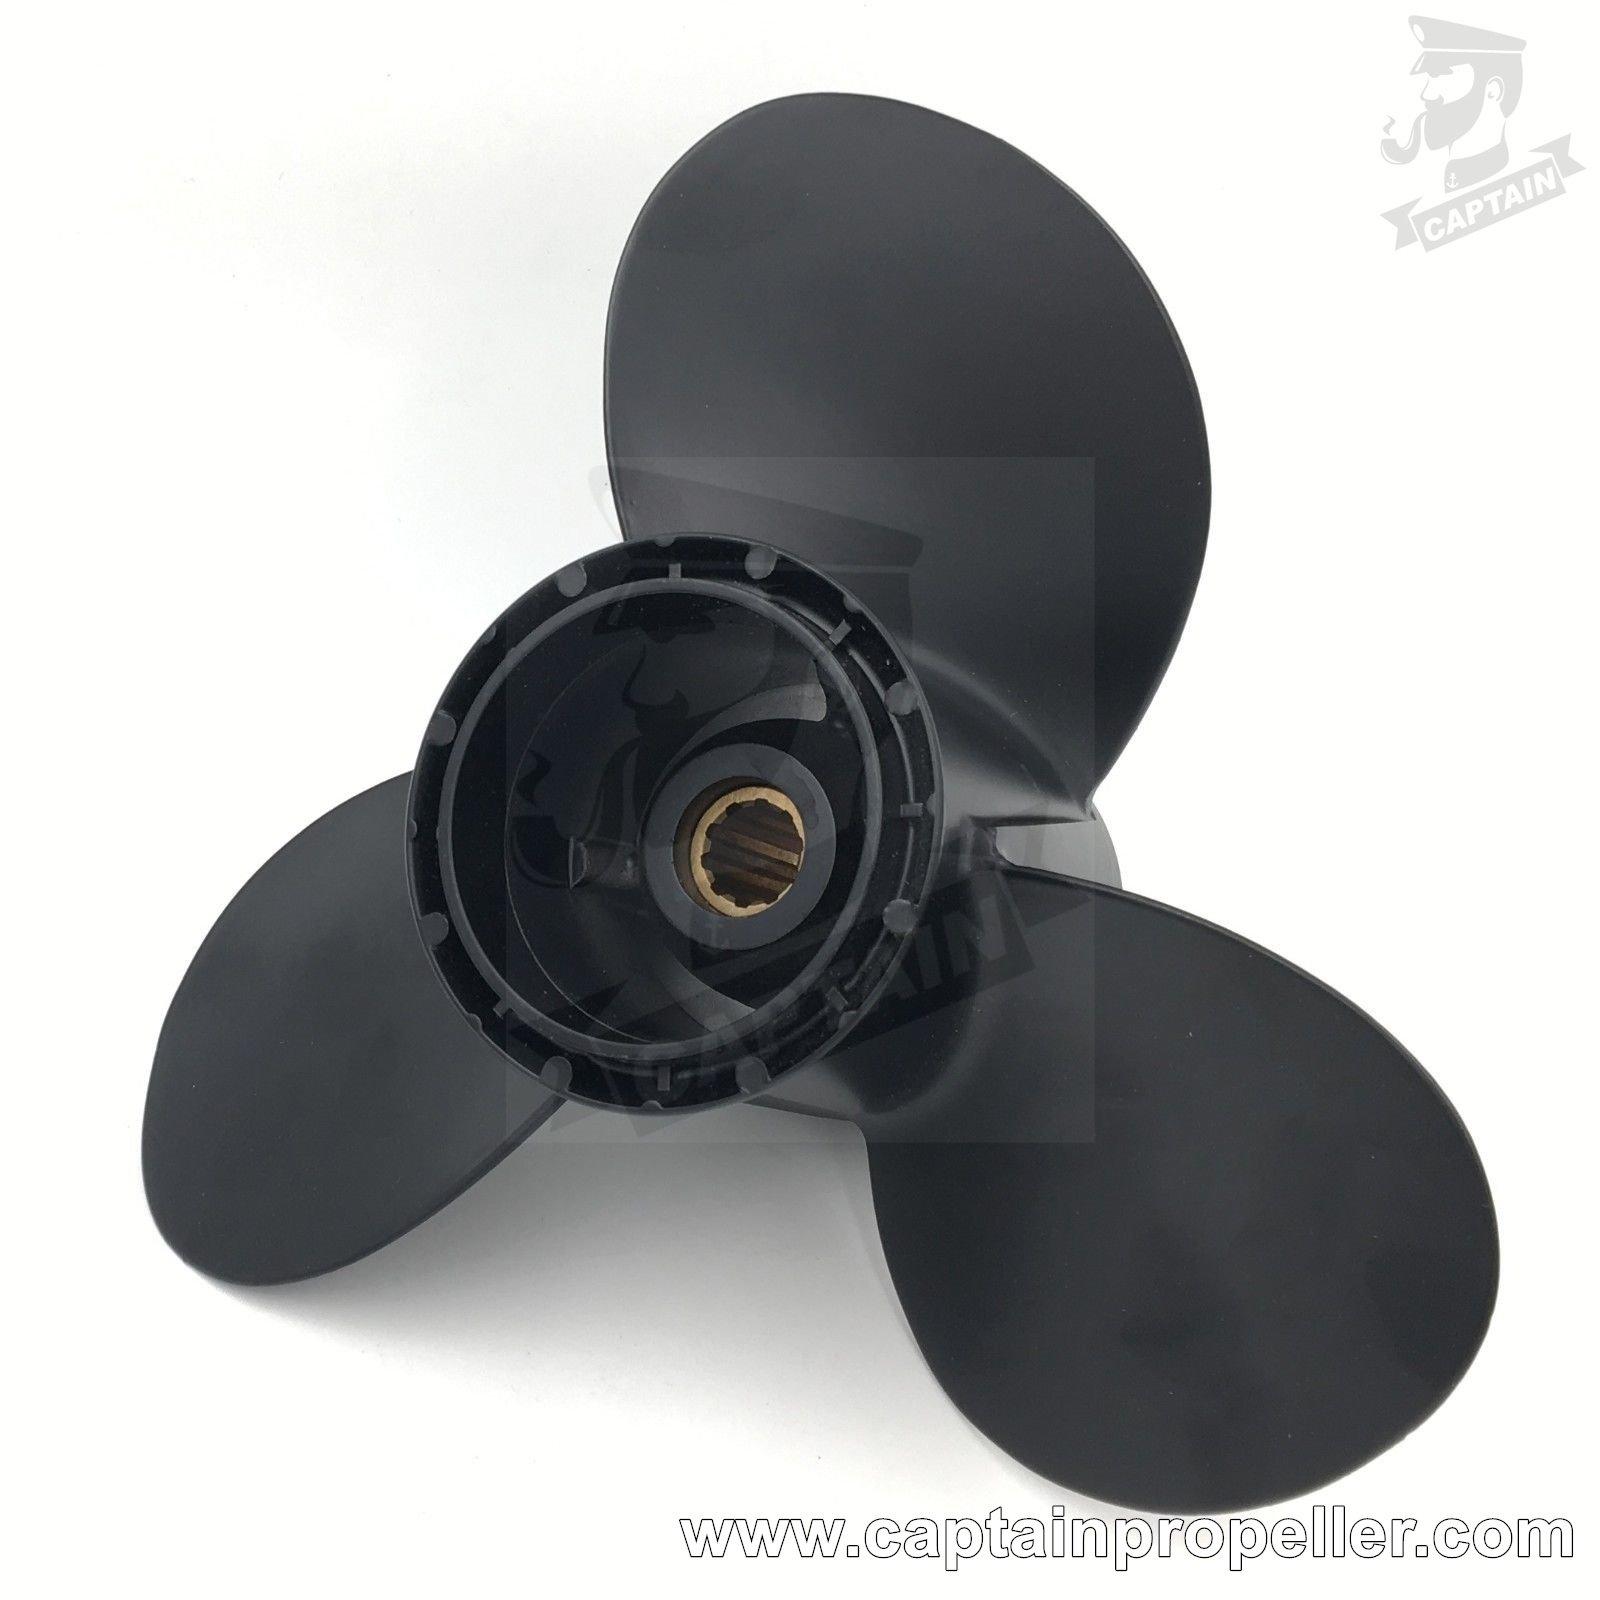 Aluminum Outboard Propeller 9 1//4x10 for Suzuki Prop 8-20HP 58100-93773-019